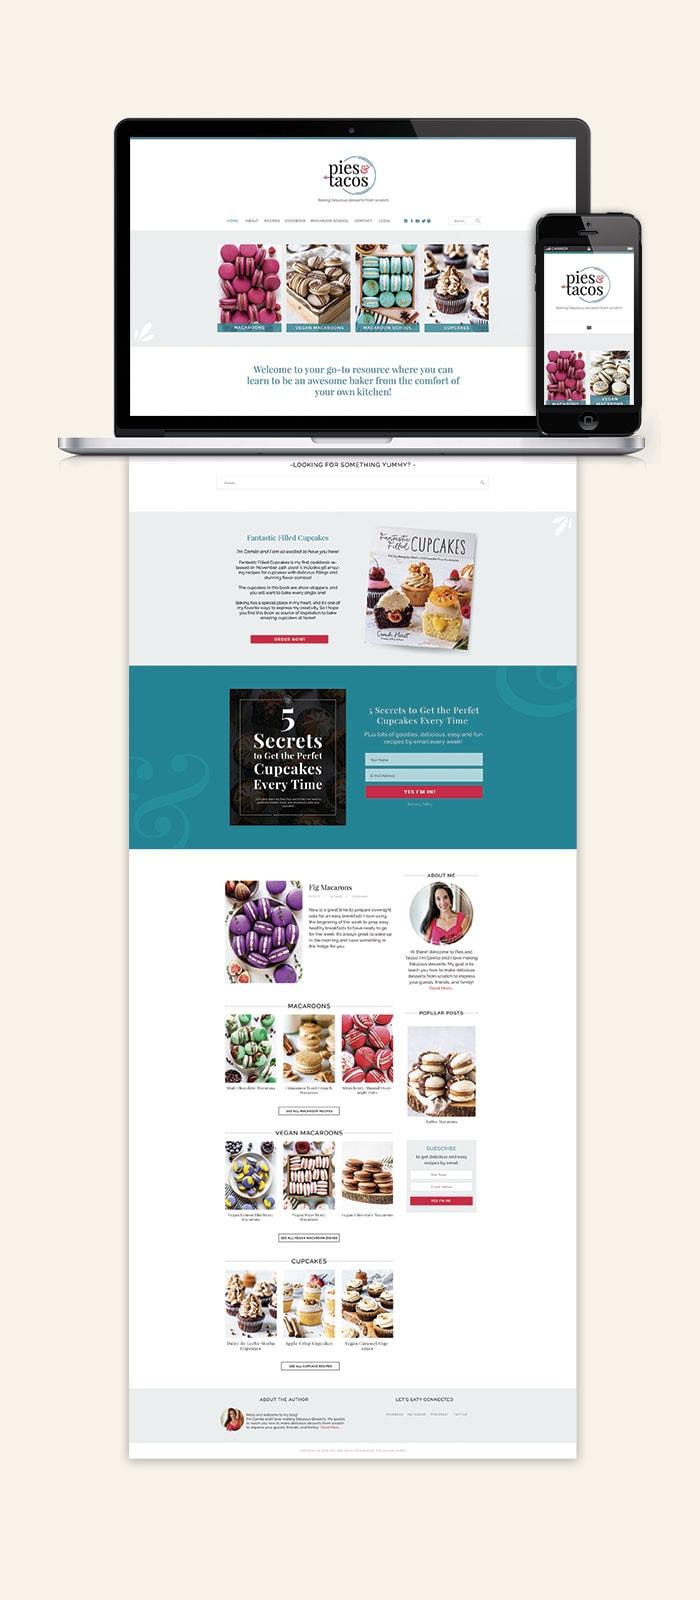 Pies & Tacos Website Blog Design 2021